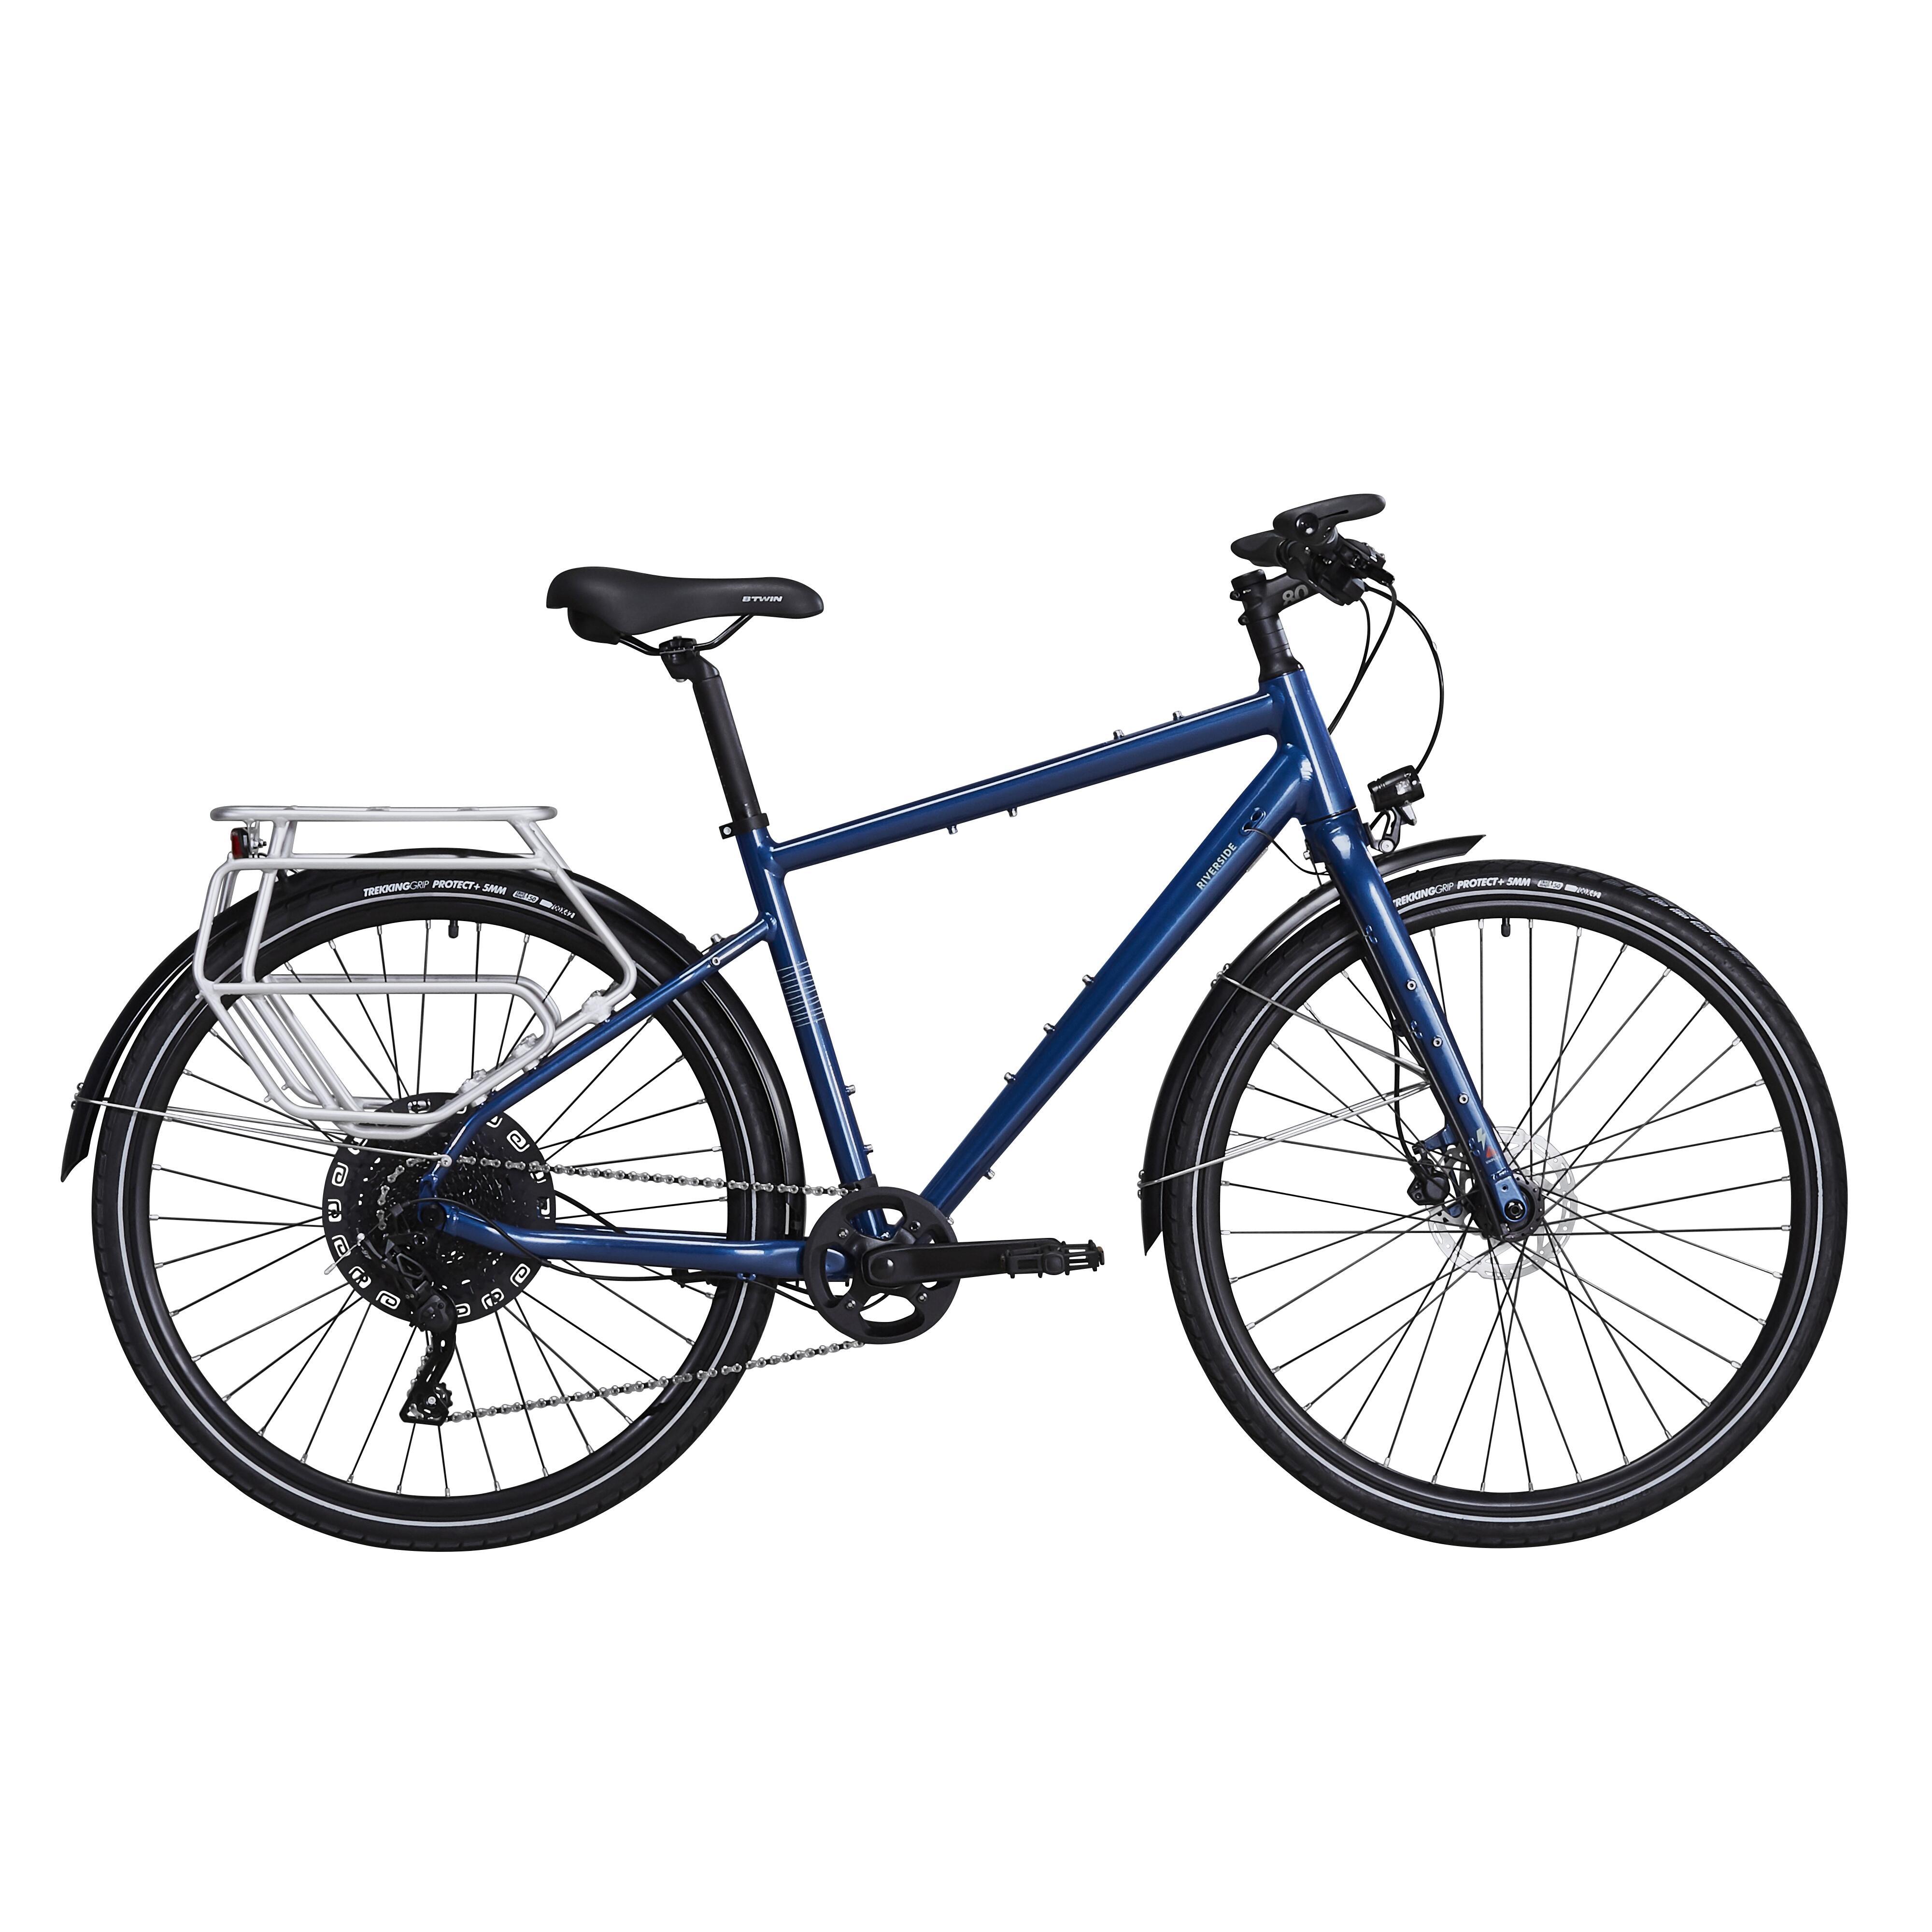 Bicicletă TOURING 520